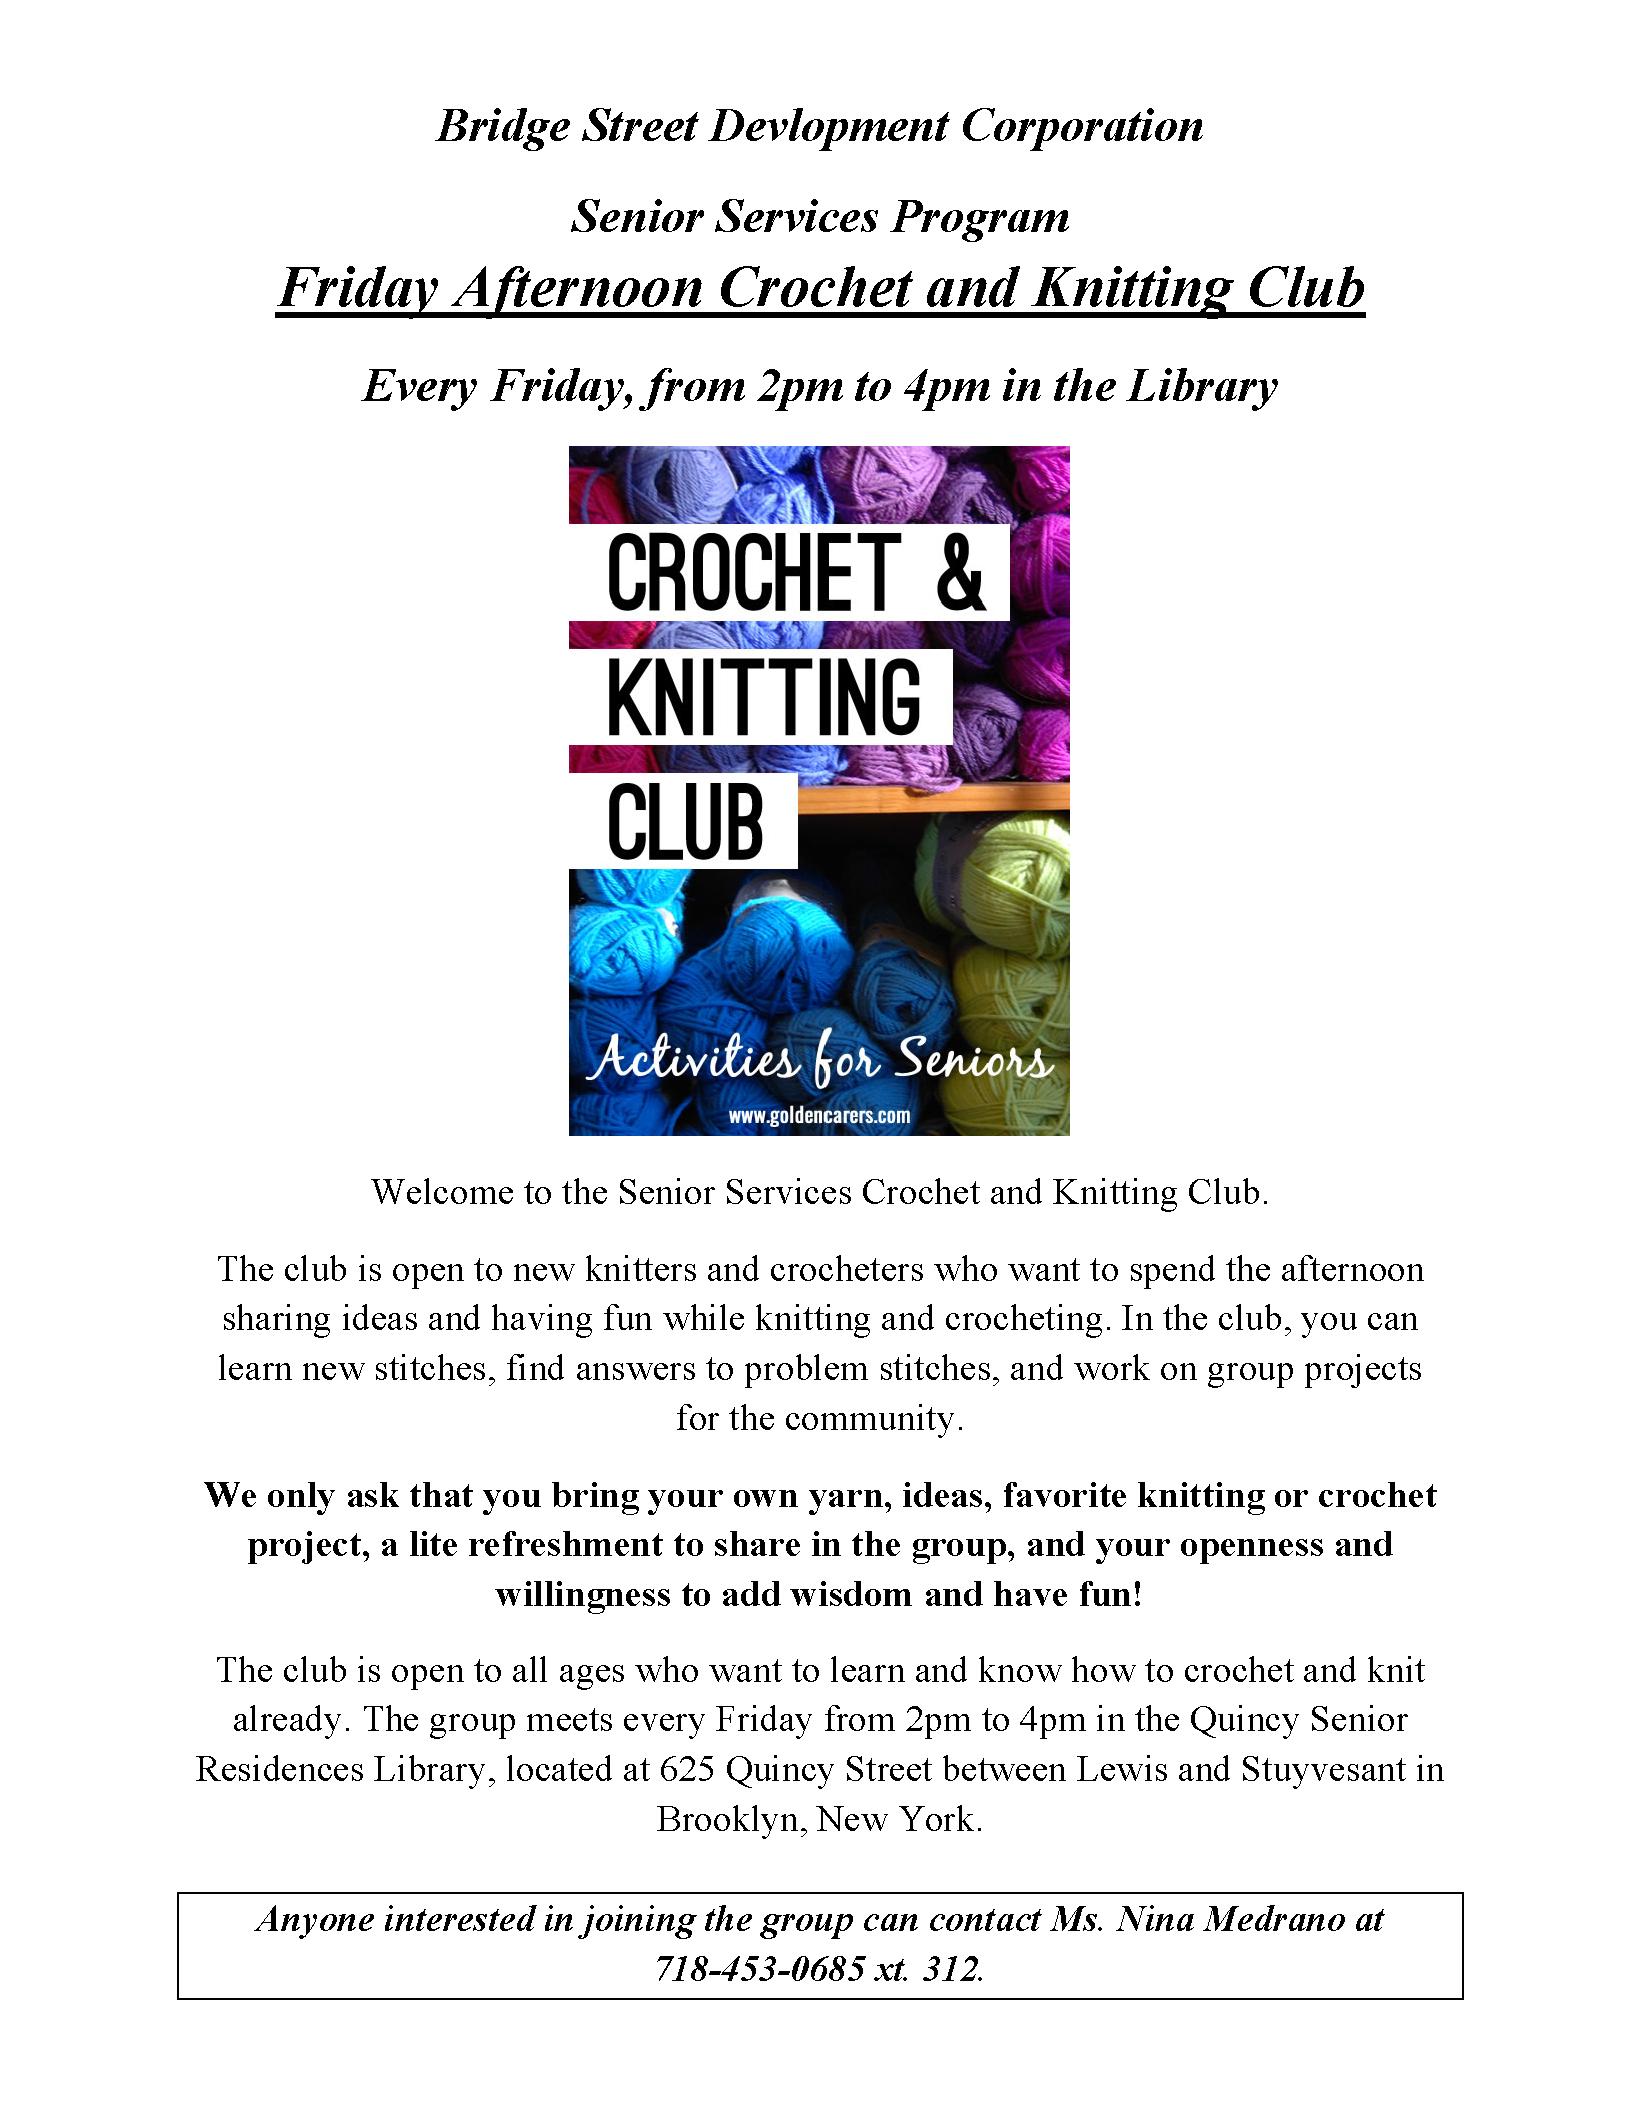 Knitting Club Flyer : Friday afternoon crochet and knitting club bridge street